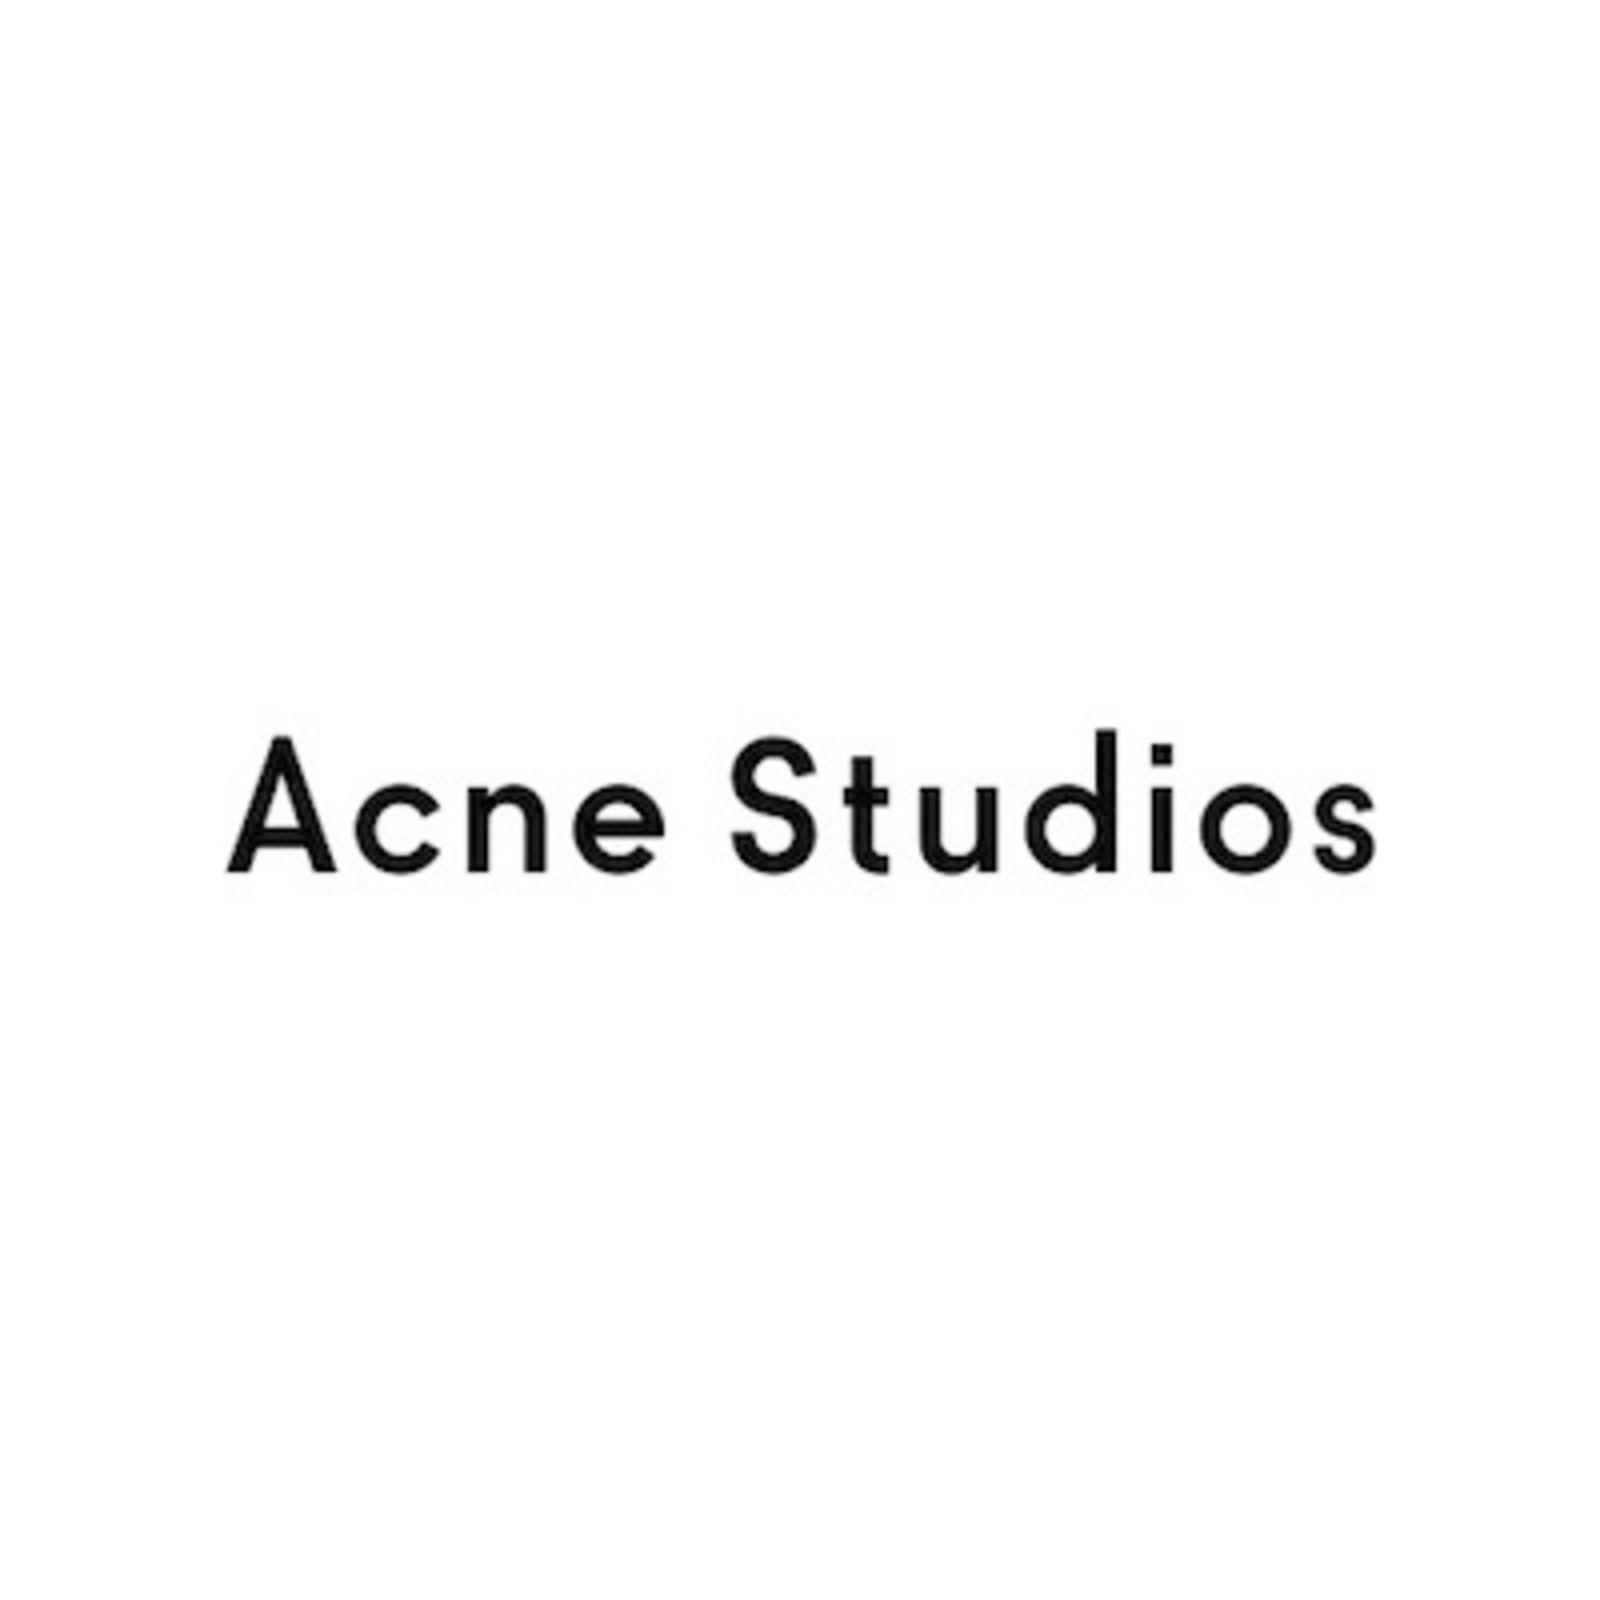 Acne Studios (Image 1)